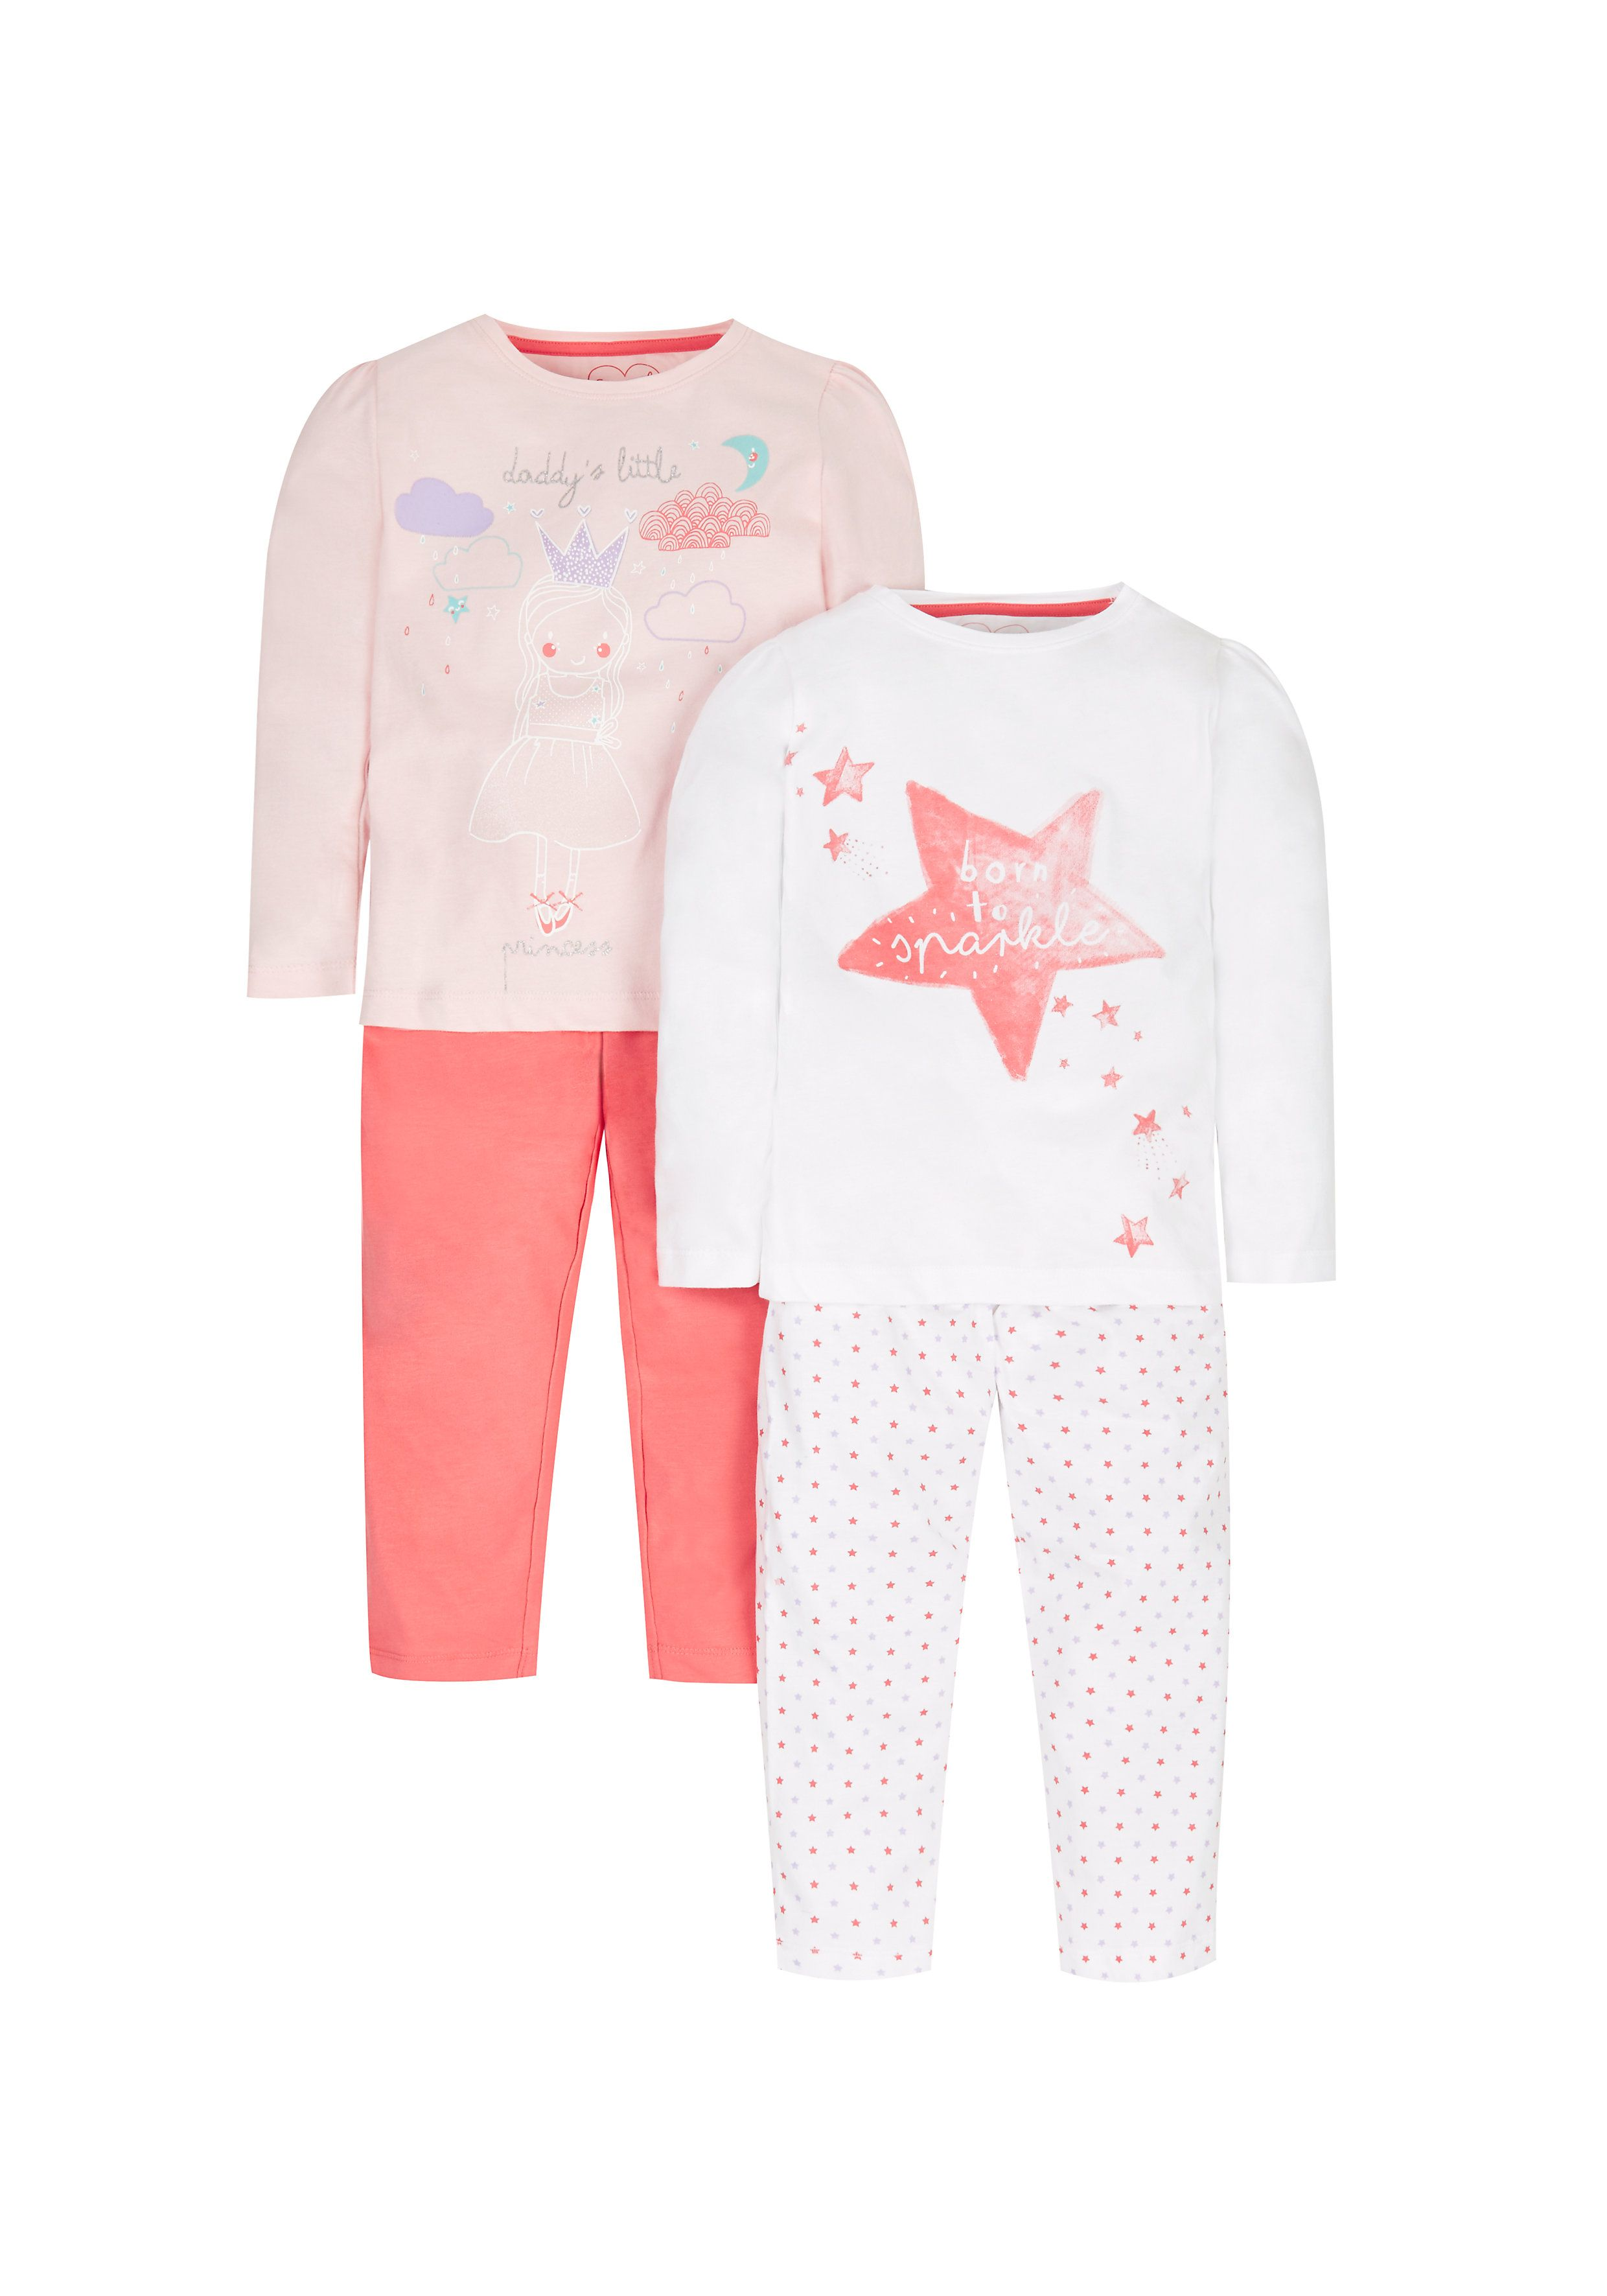 Mothercare | Princess Pyjamas - 2 Pack